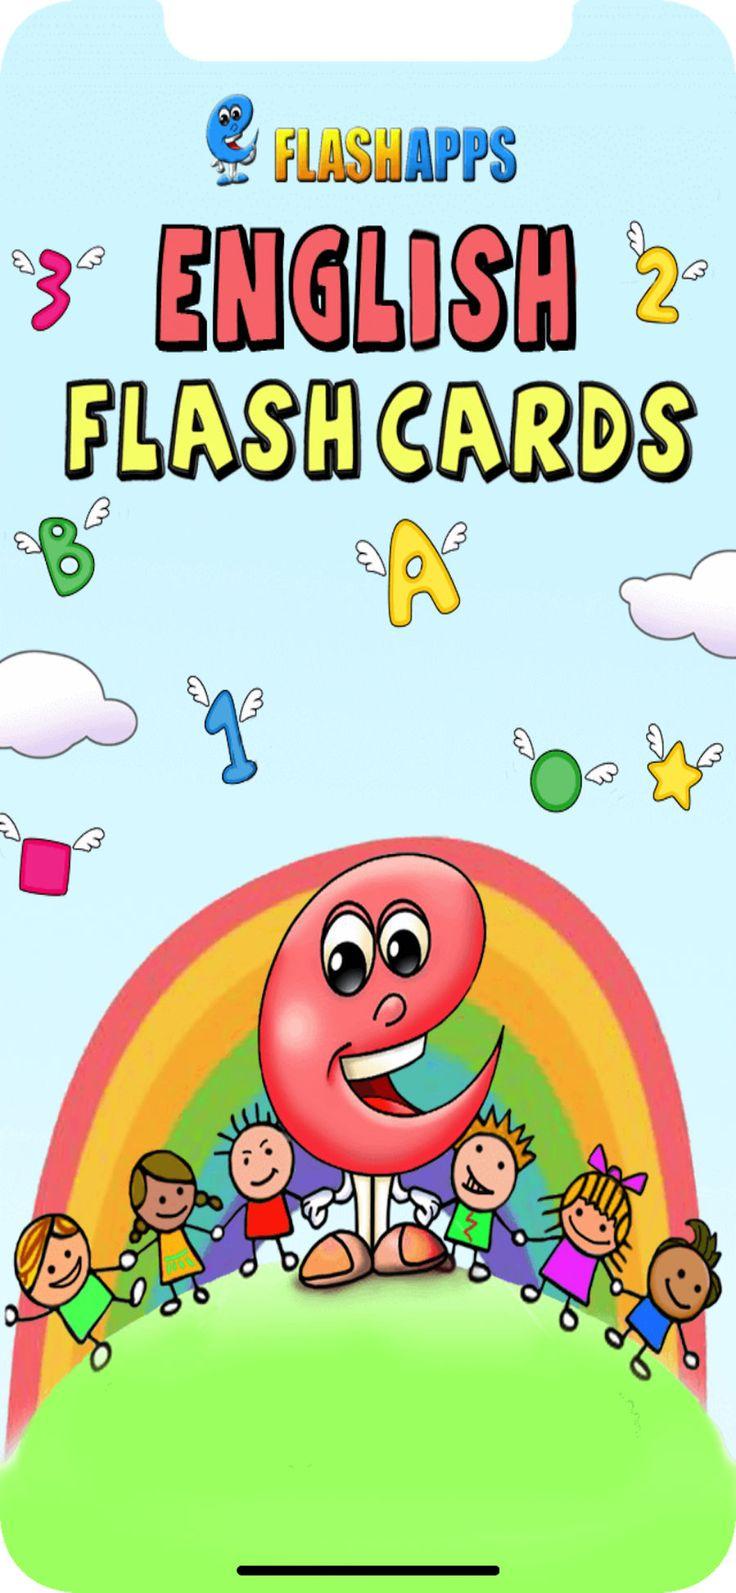 Baby flash cards 500 words llceflashappseducation